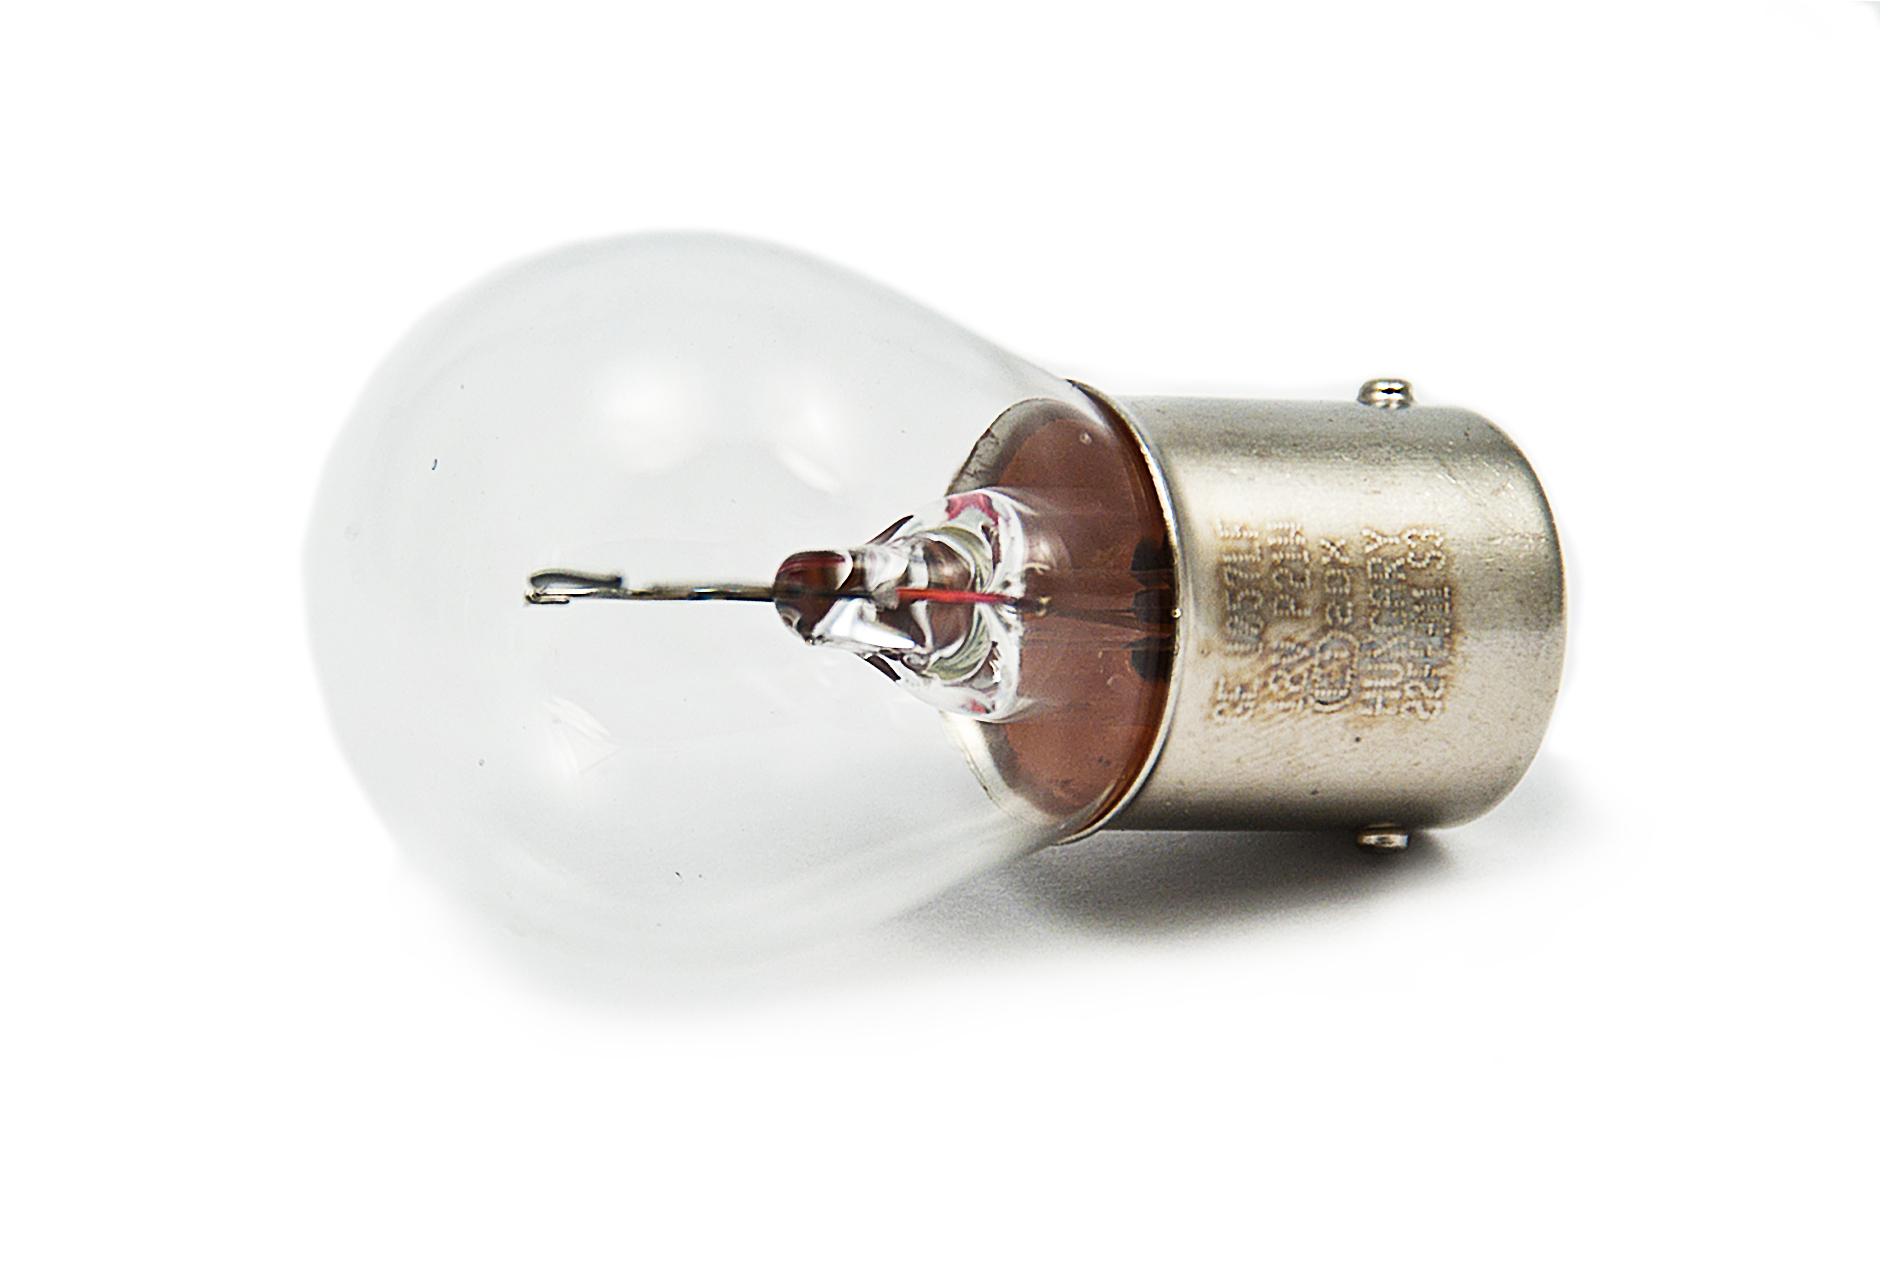 Bmw 12v 21w Indicator Rear Tail Light Bulb Fits Most 63217160790 Ebay